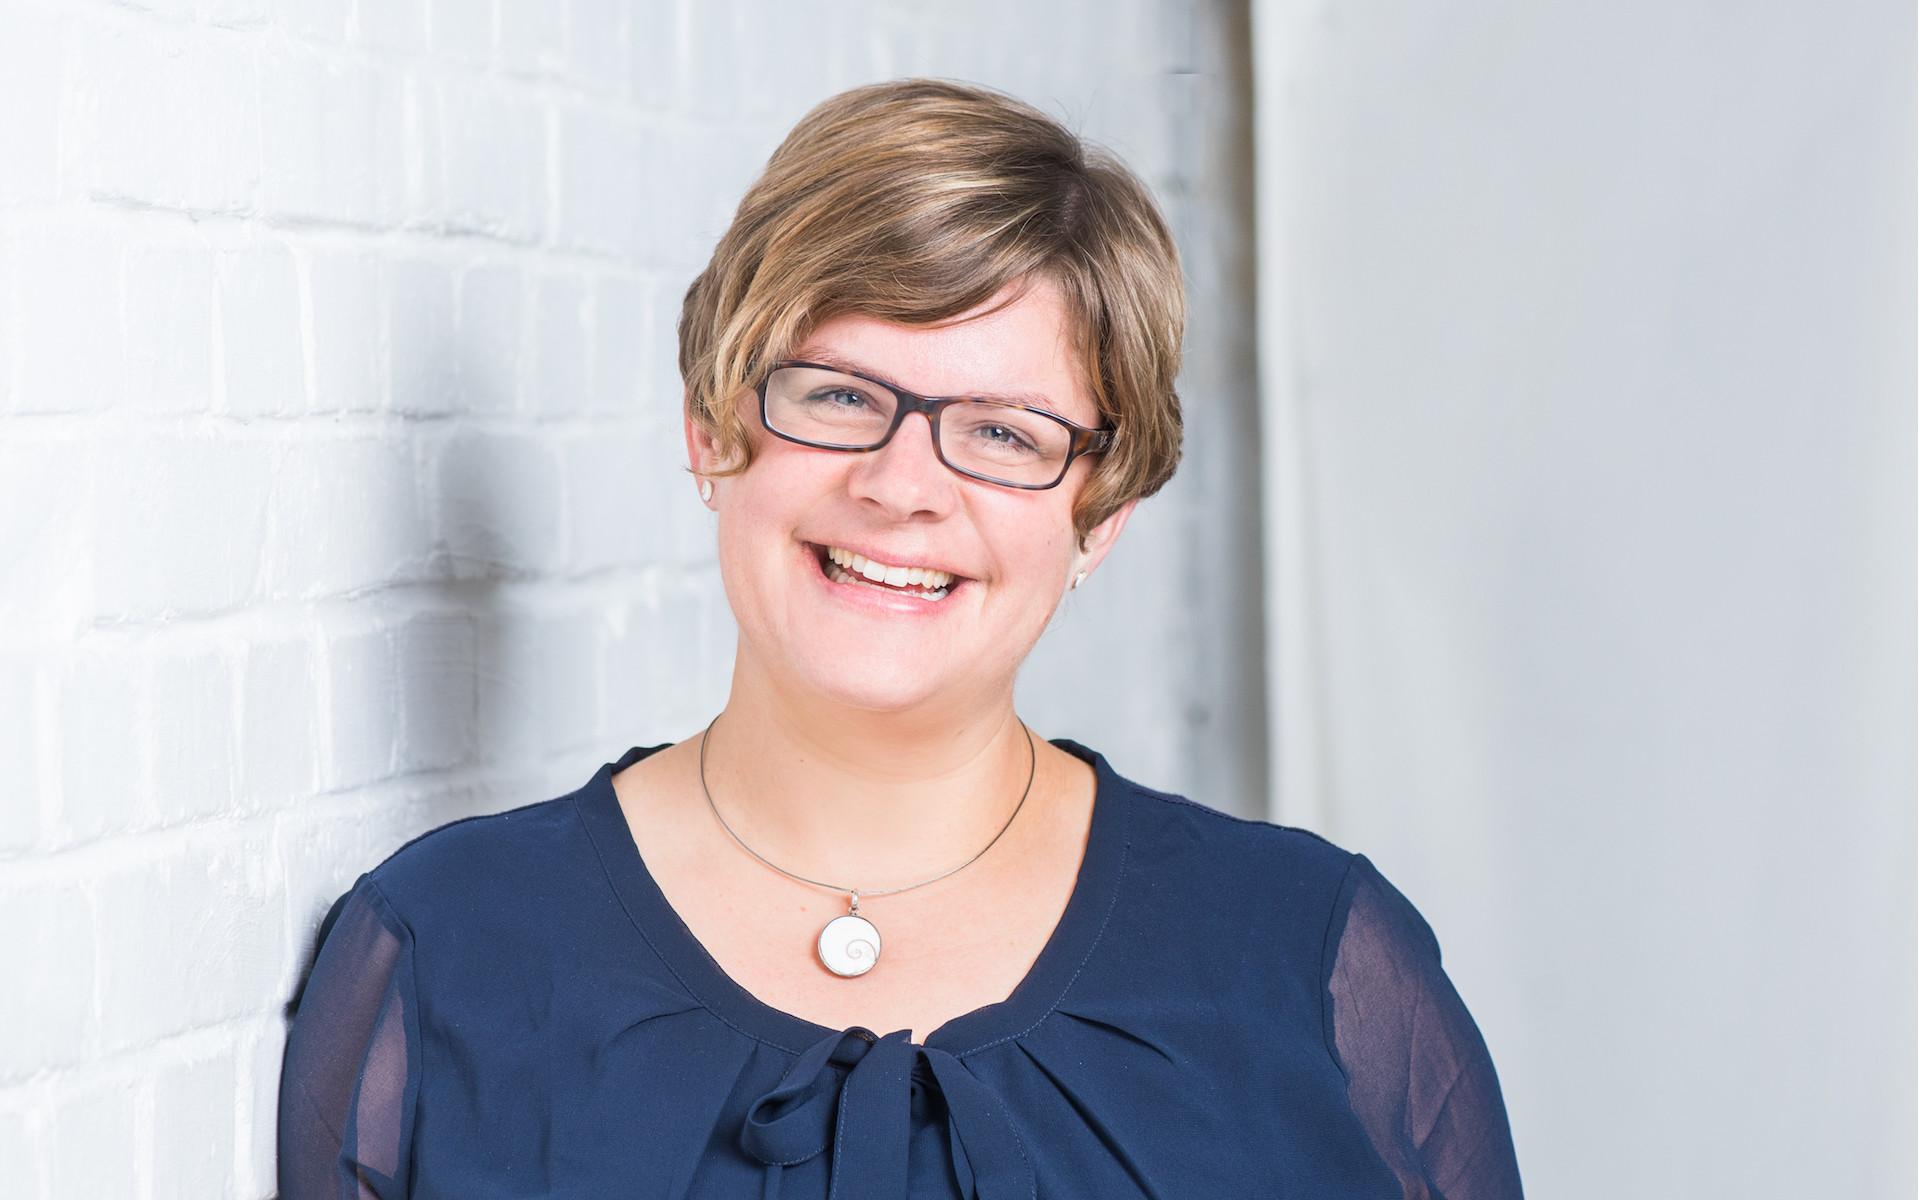 Profilbild Susanne Rosenthal